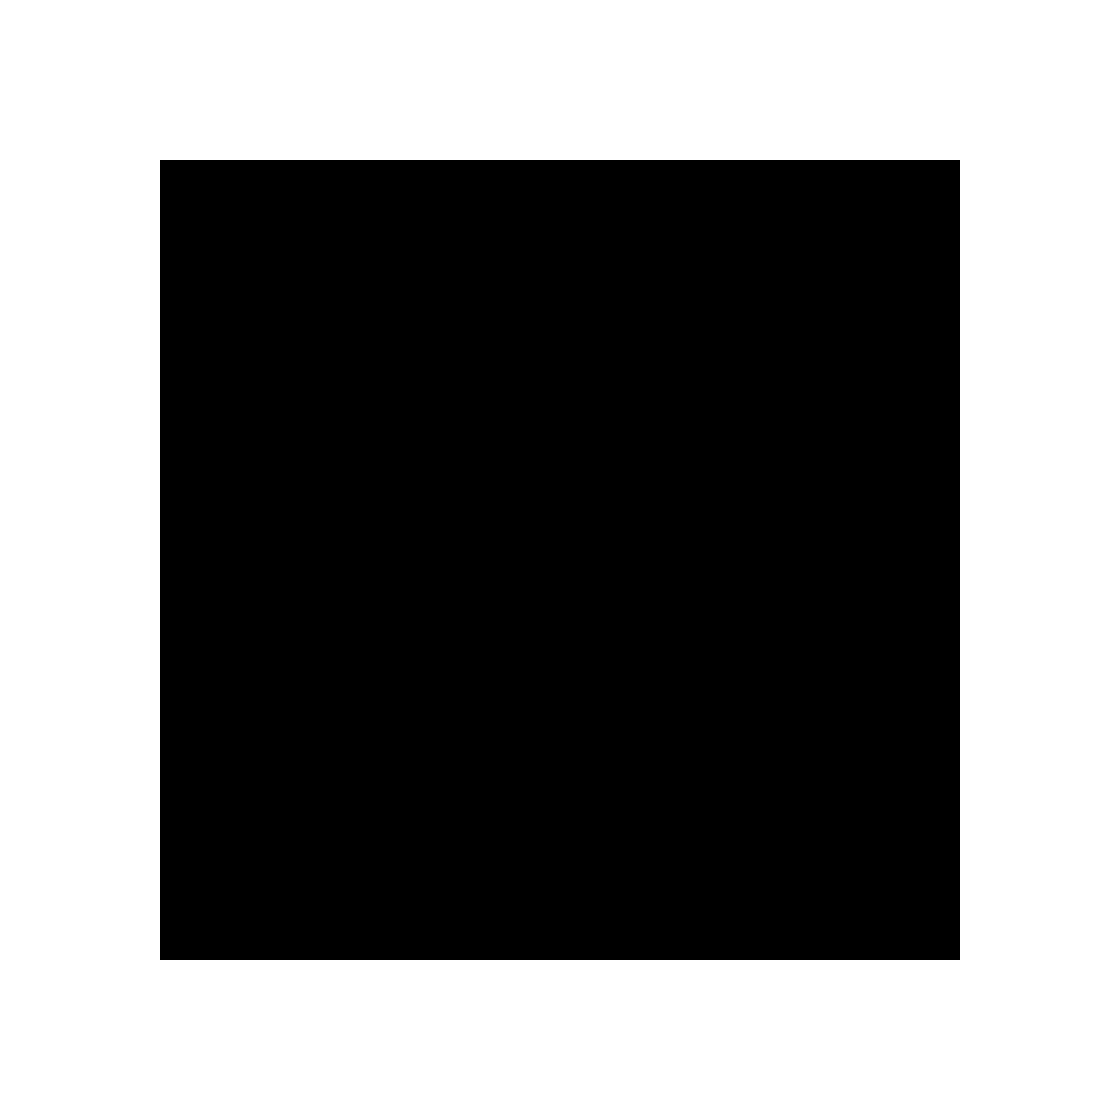 Coin_OP_San_Francisco_logo.png